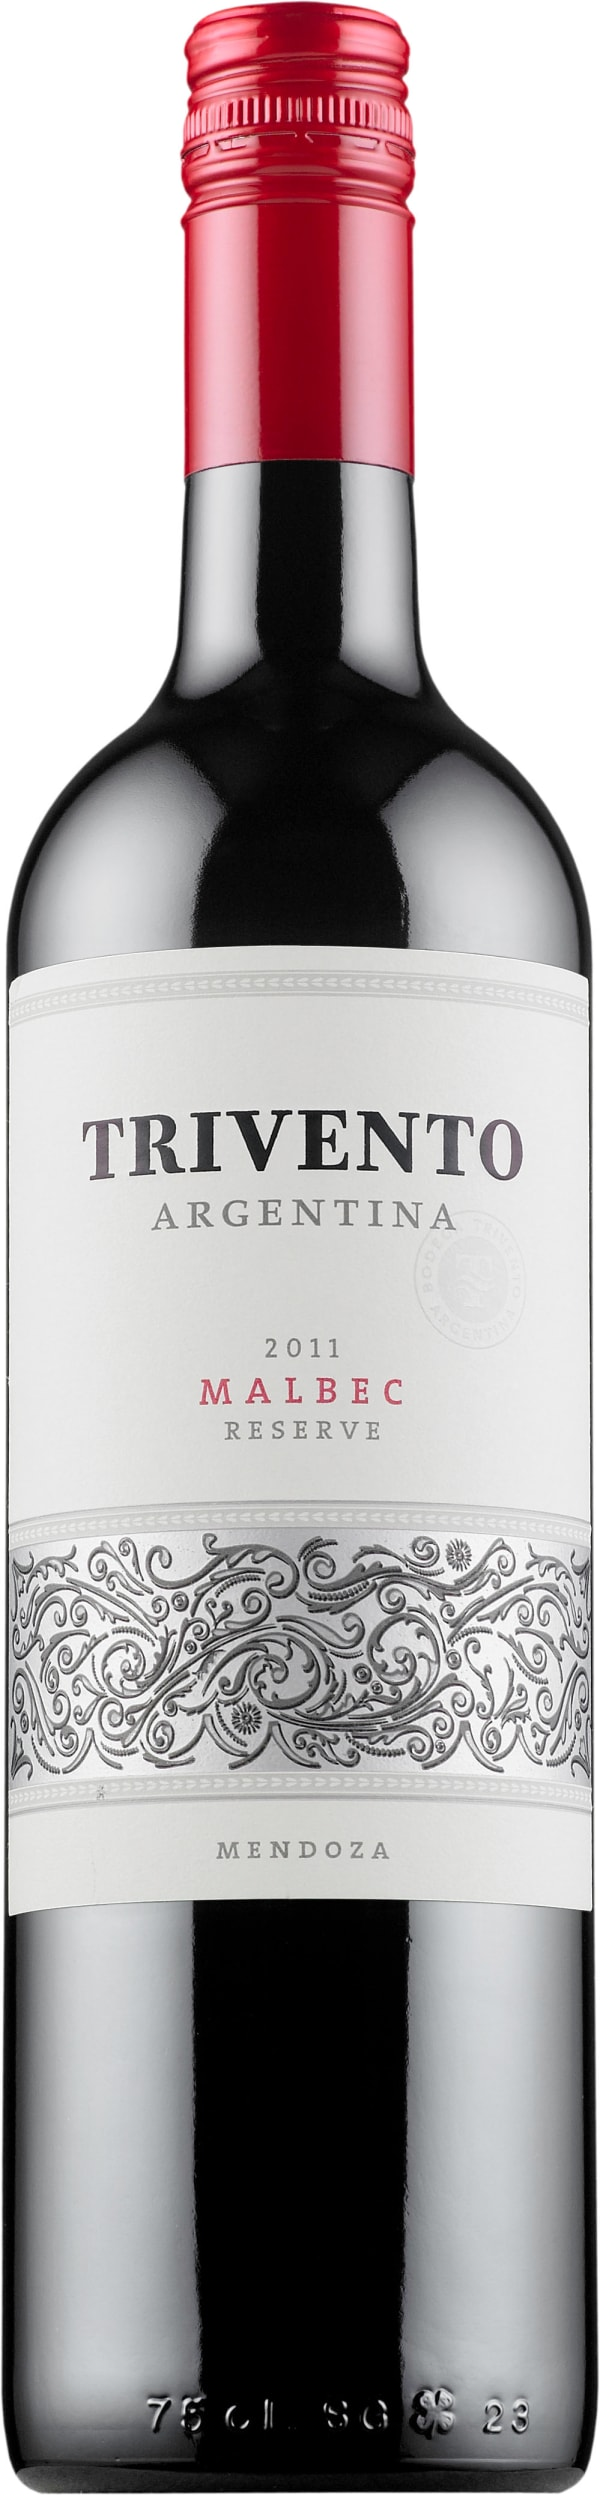 Trivento Reserve Malbec 2017